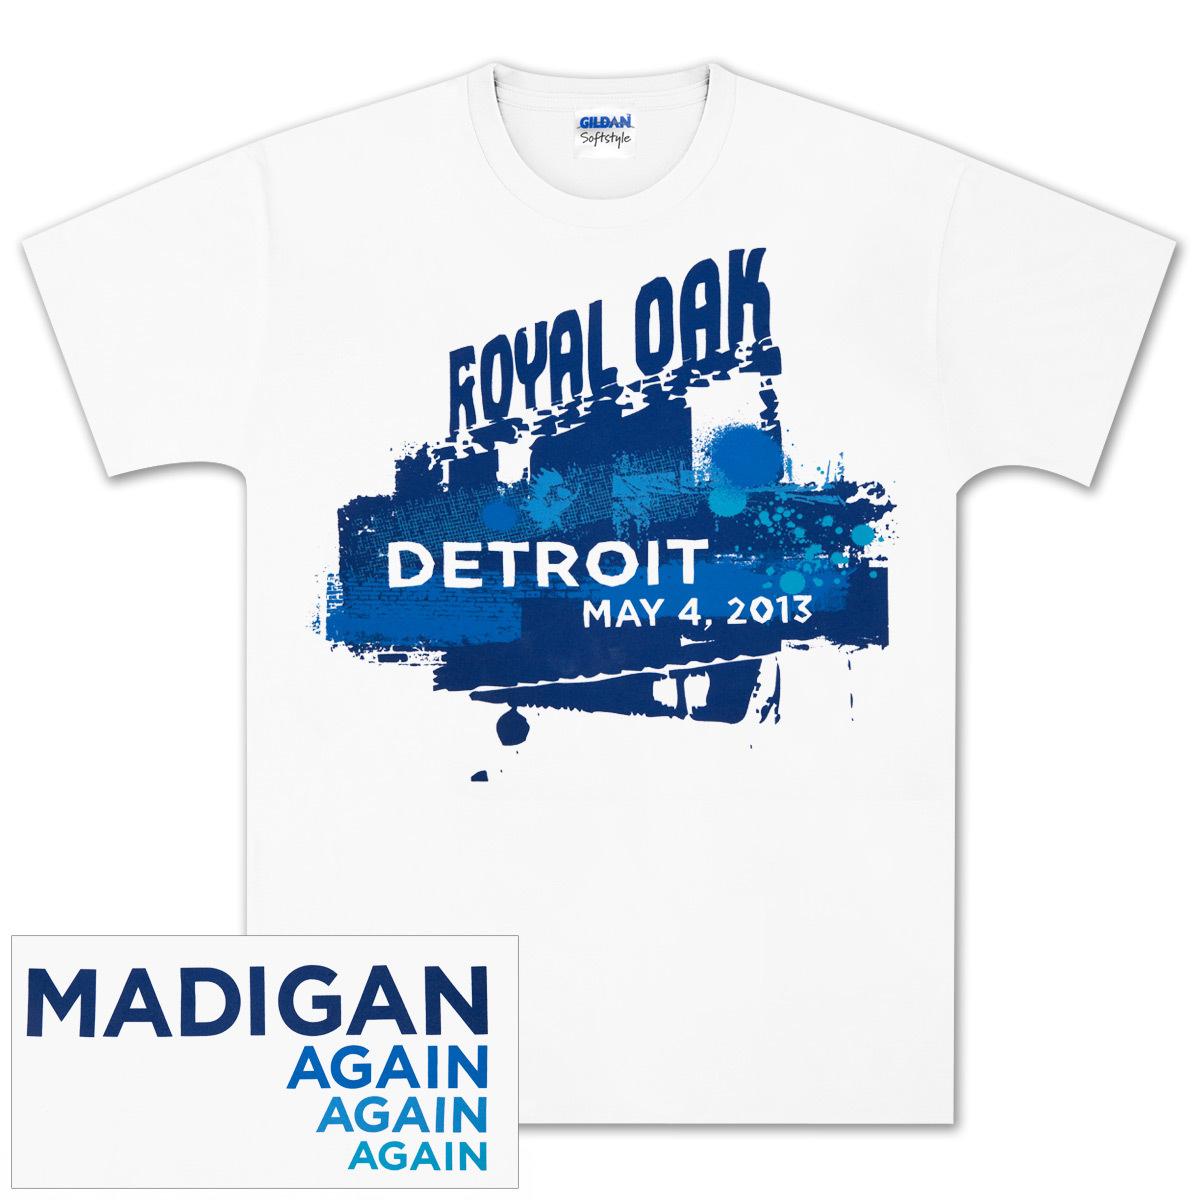 Kathleen Madigan - Men's Madigan Again T-Shirt